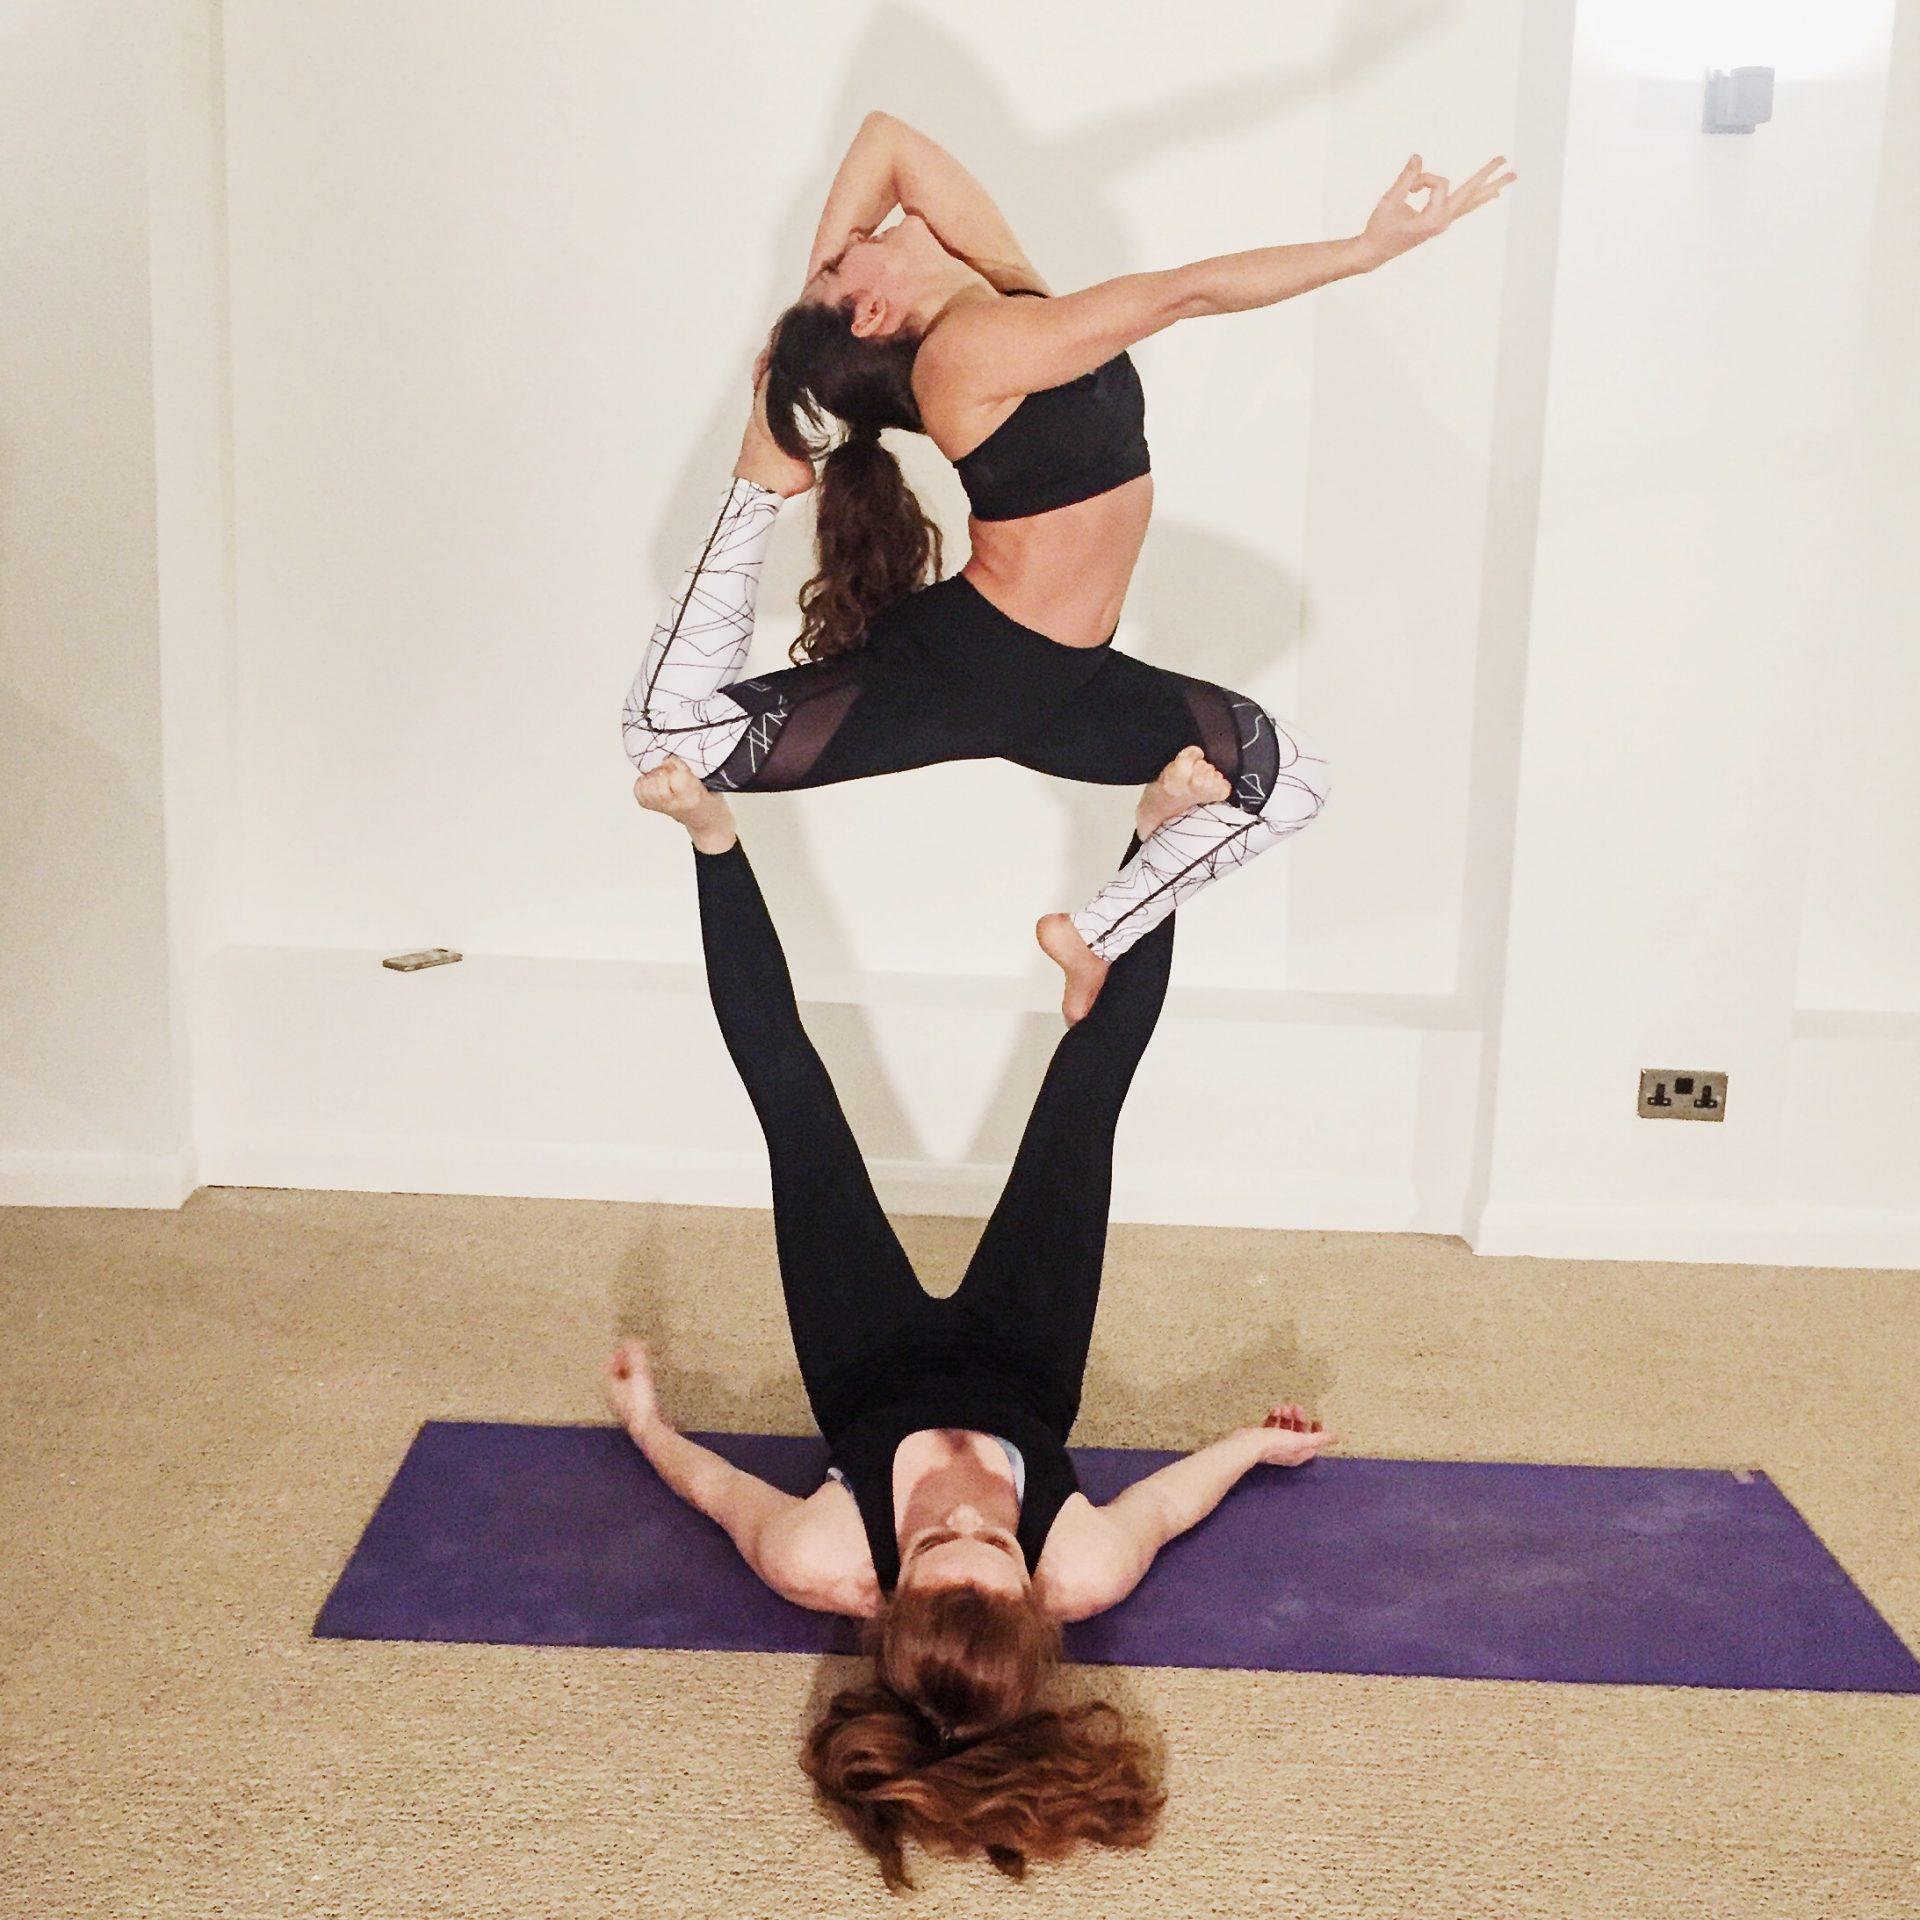 fabletics yoga pants acro yoga